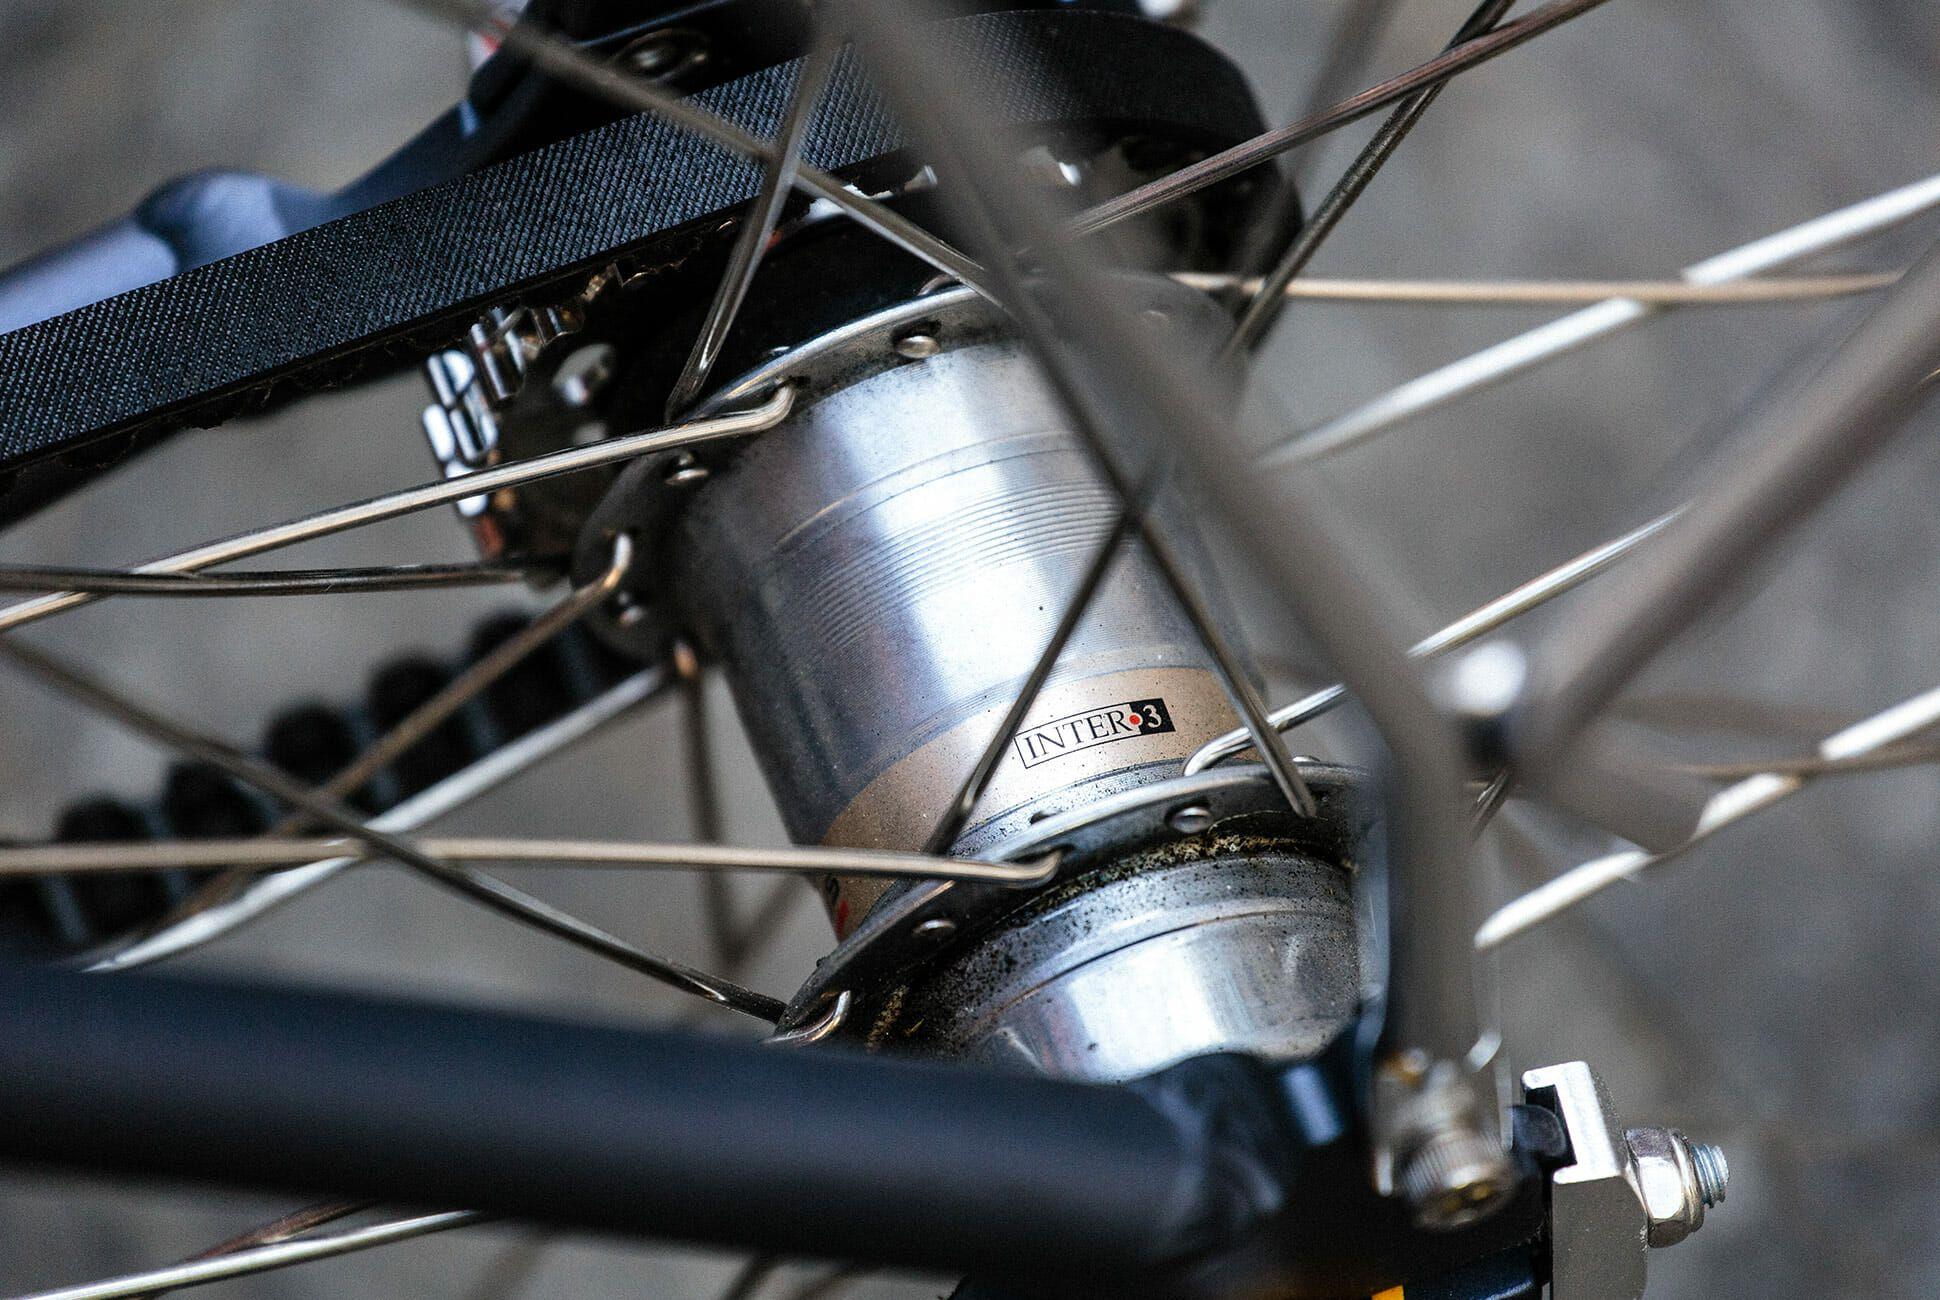 Priority-No-Maintenance-Bike-gear-patrol-slide-6